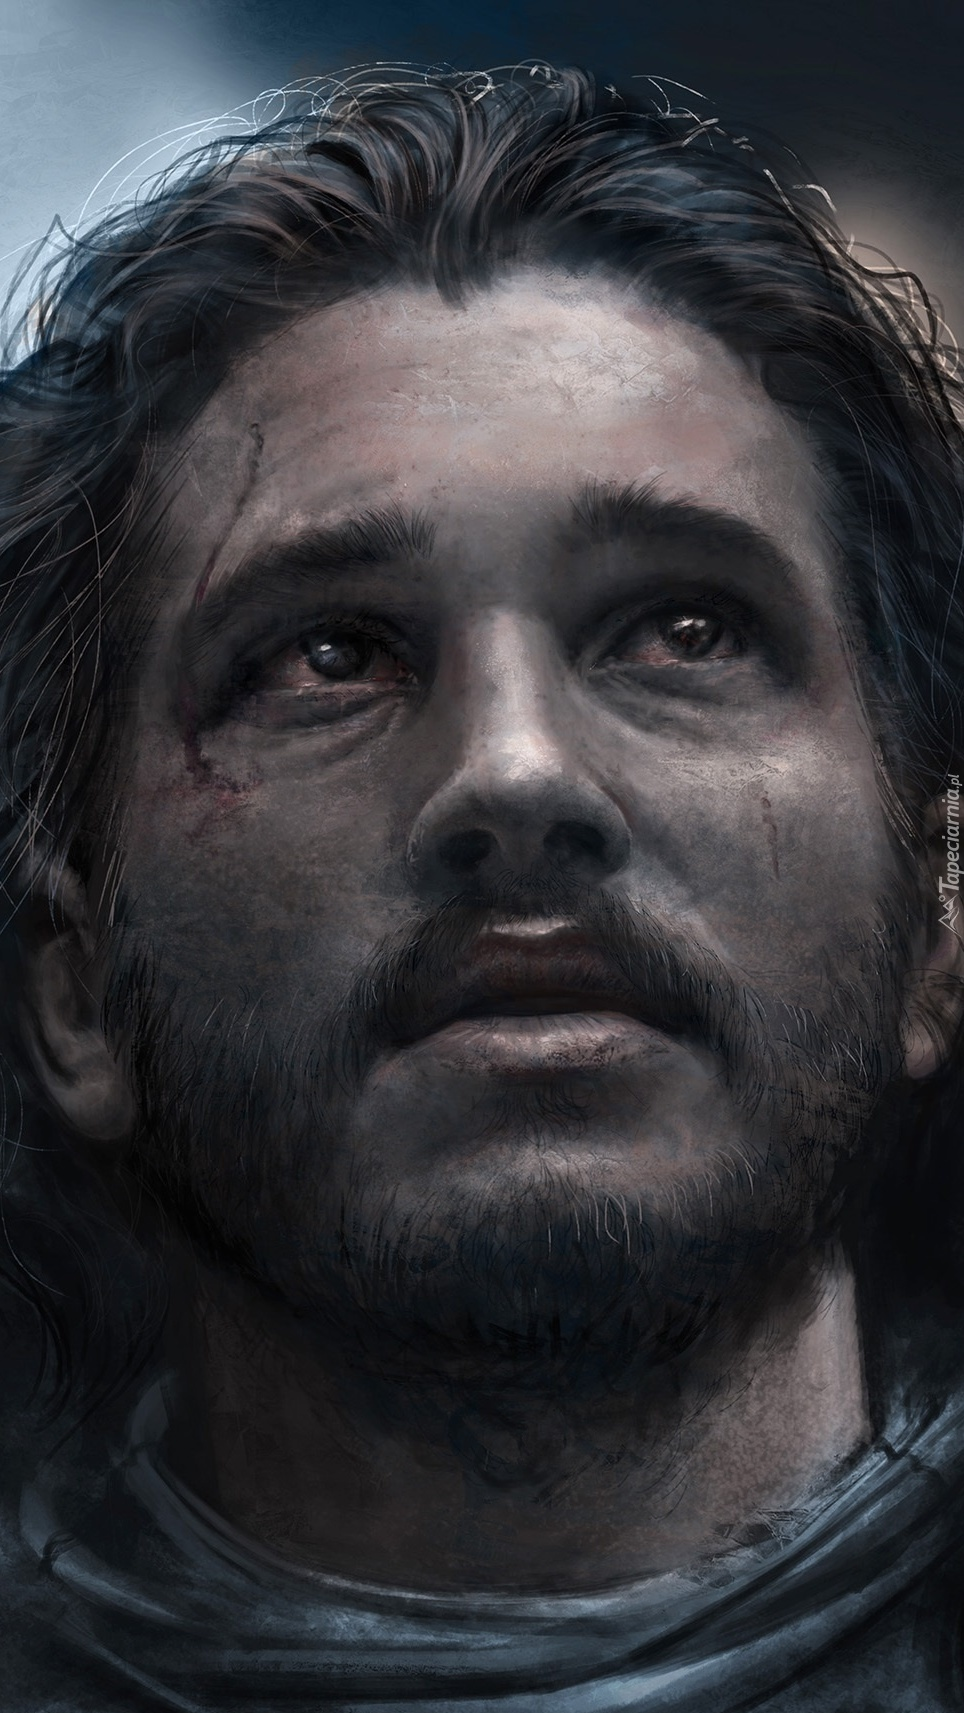 Kit Harington z Gry o tron